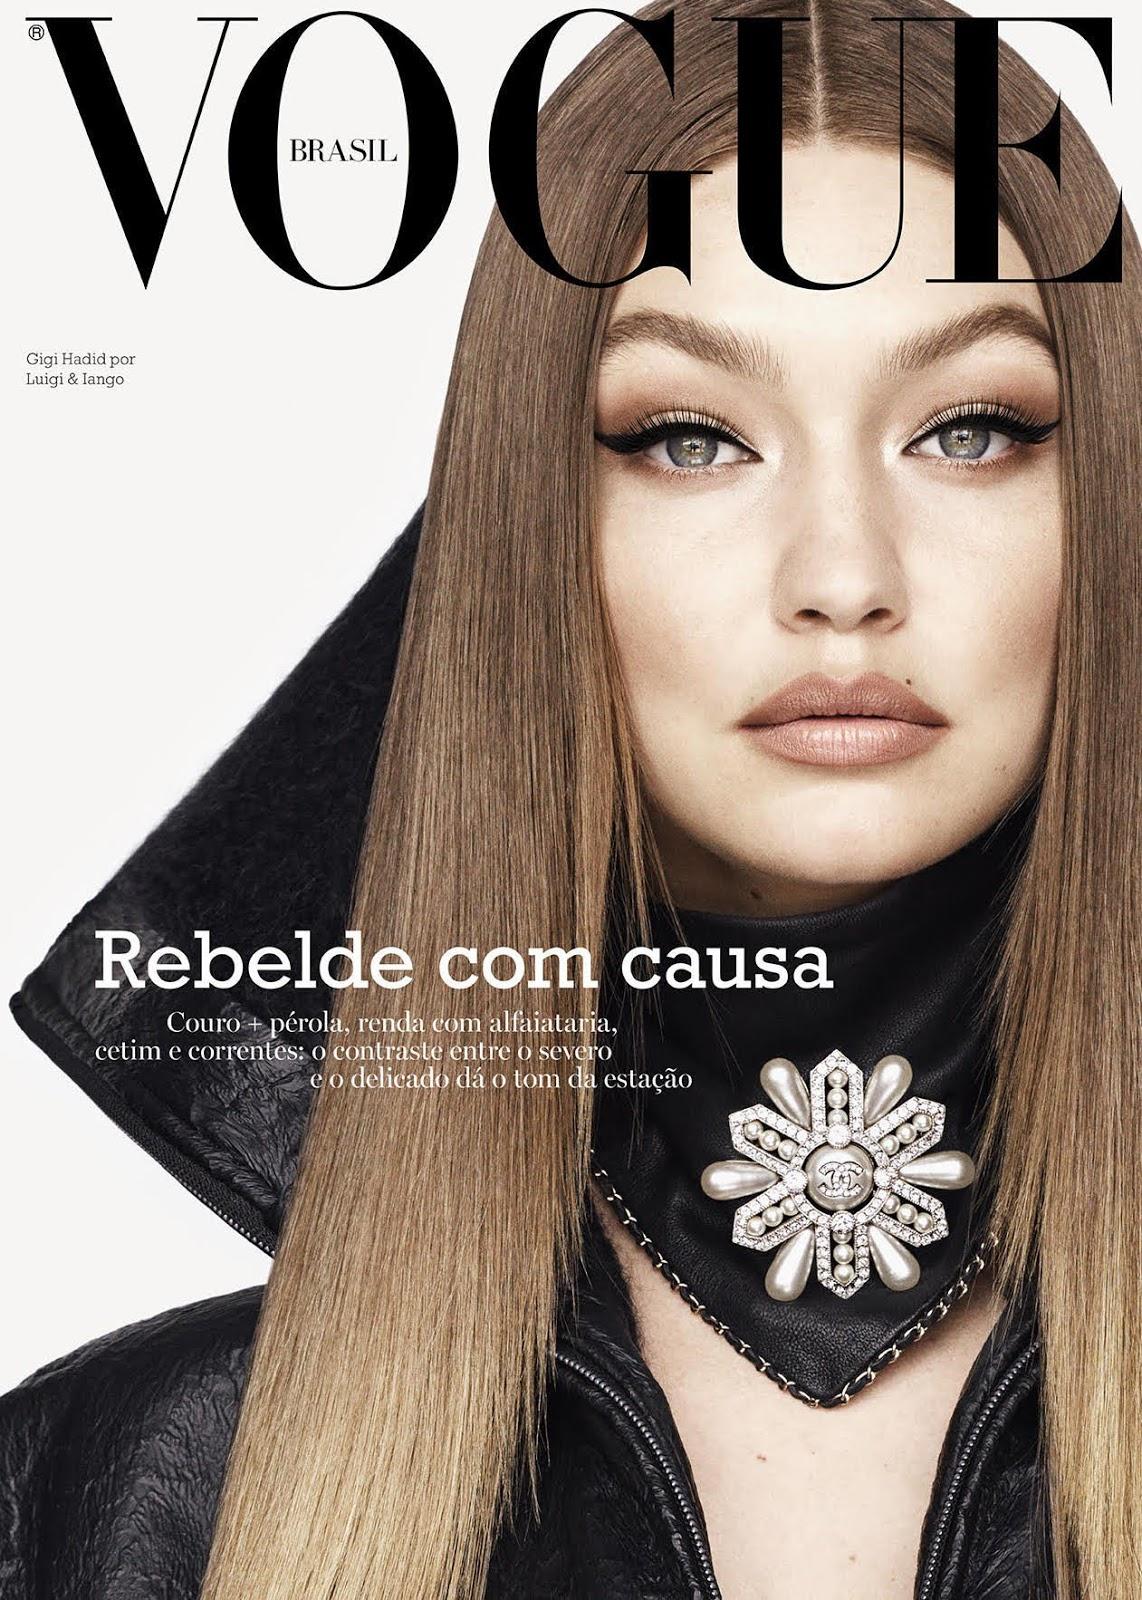 Gigi-Hadid-Luigi-Iango-Vogue-Brazil-Sept-2019 (3).jpg